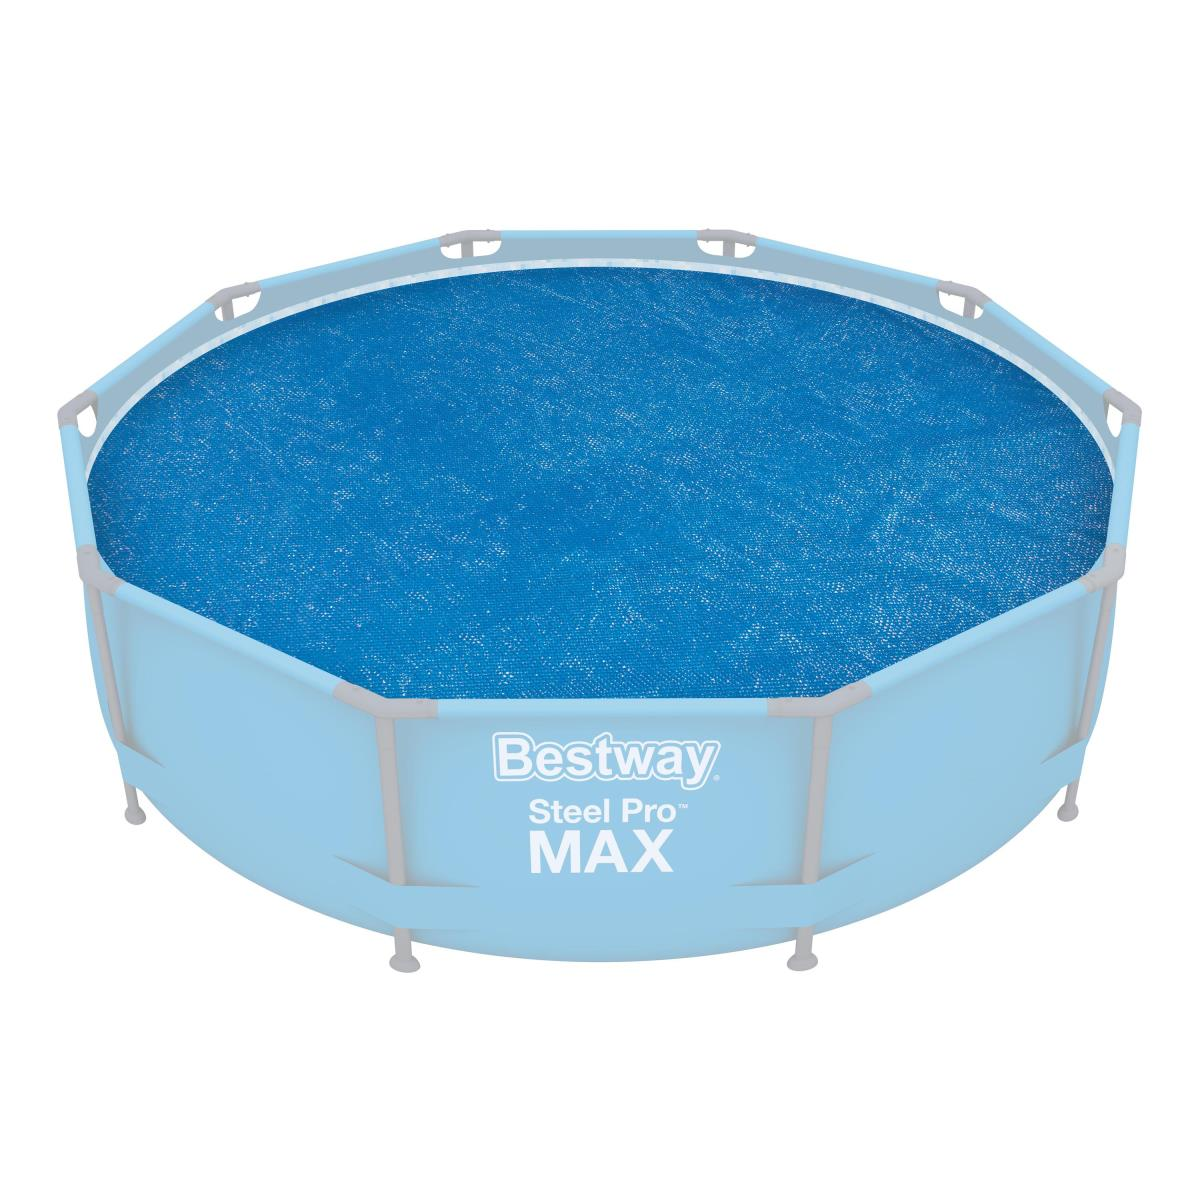 Bestway Flowclear Solarabdeckplane  Ø 289 cm Poolabdeckung Abdeckplane Pool,Bestway,58241, 6942138918861